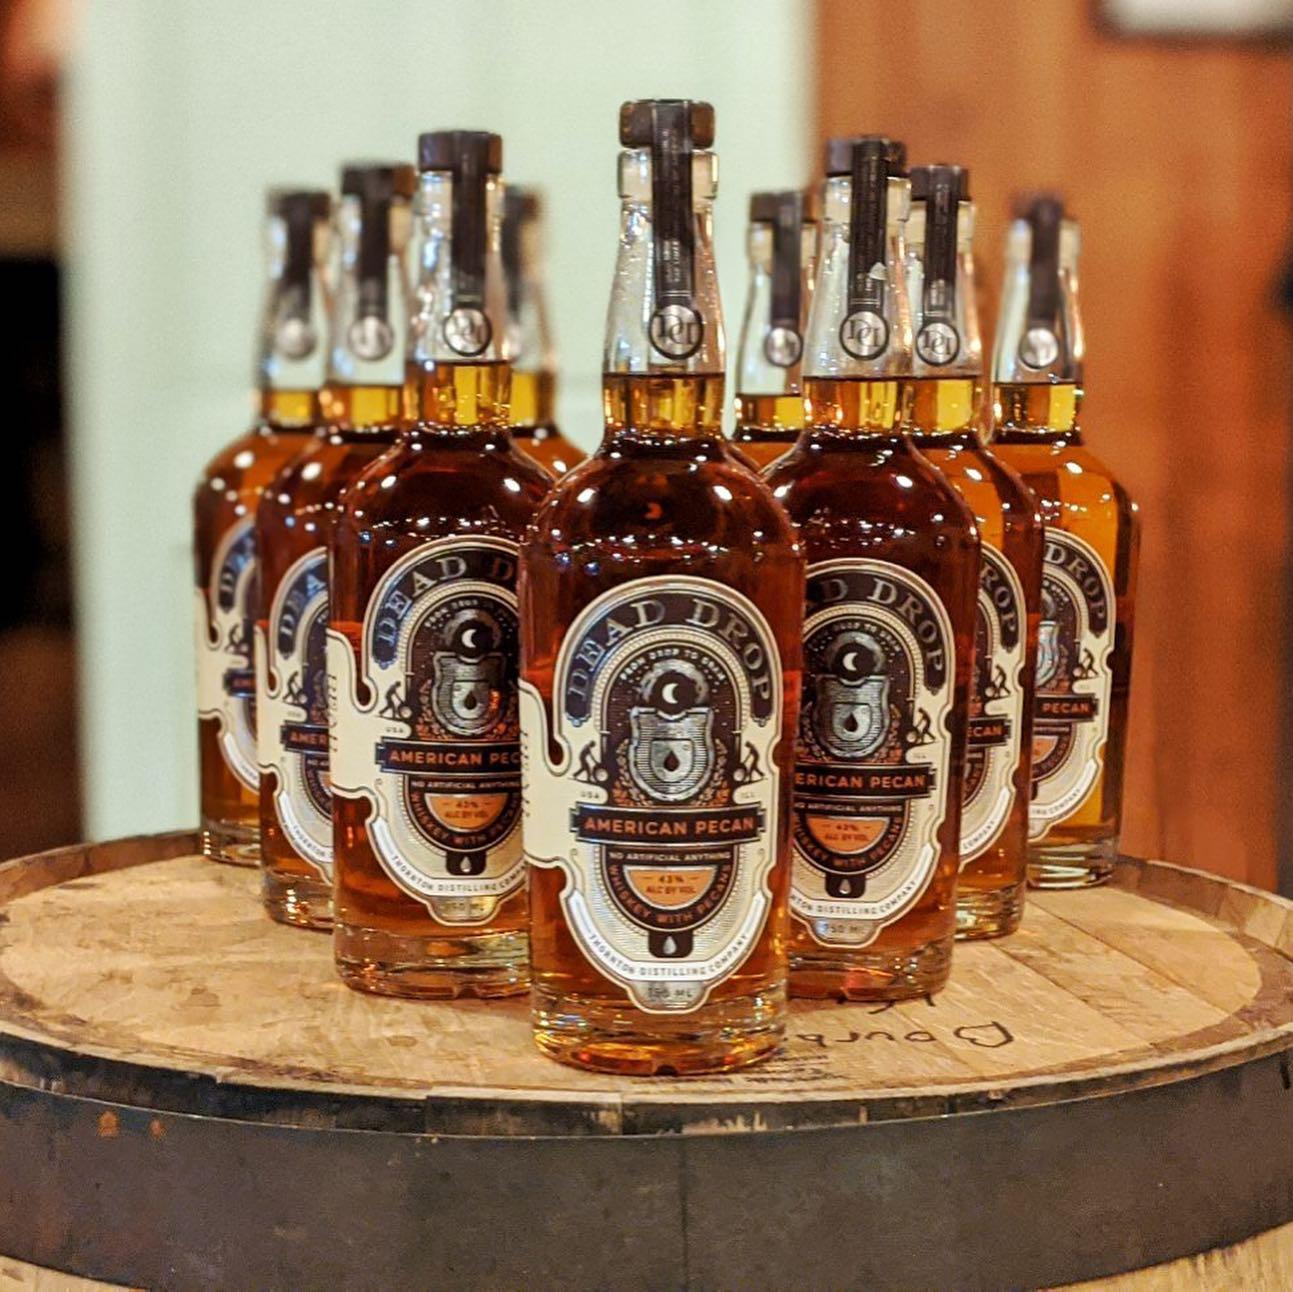 Thornton Distilling